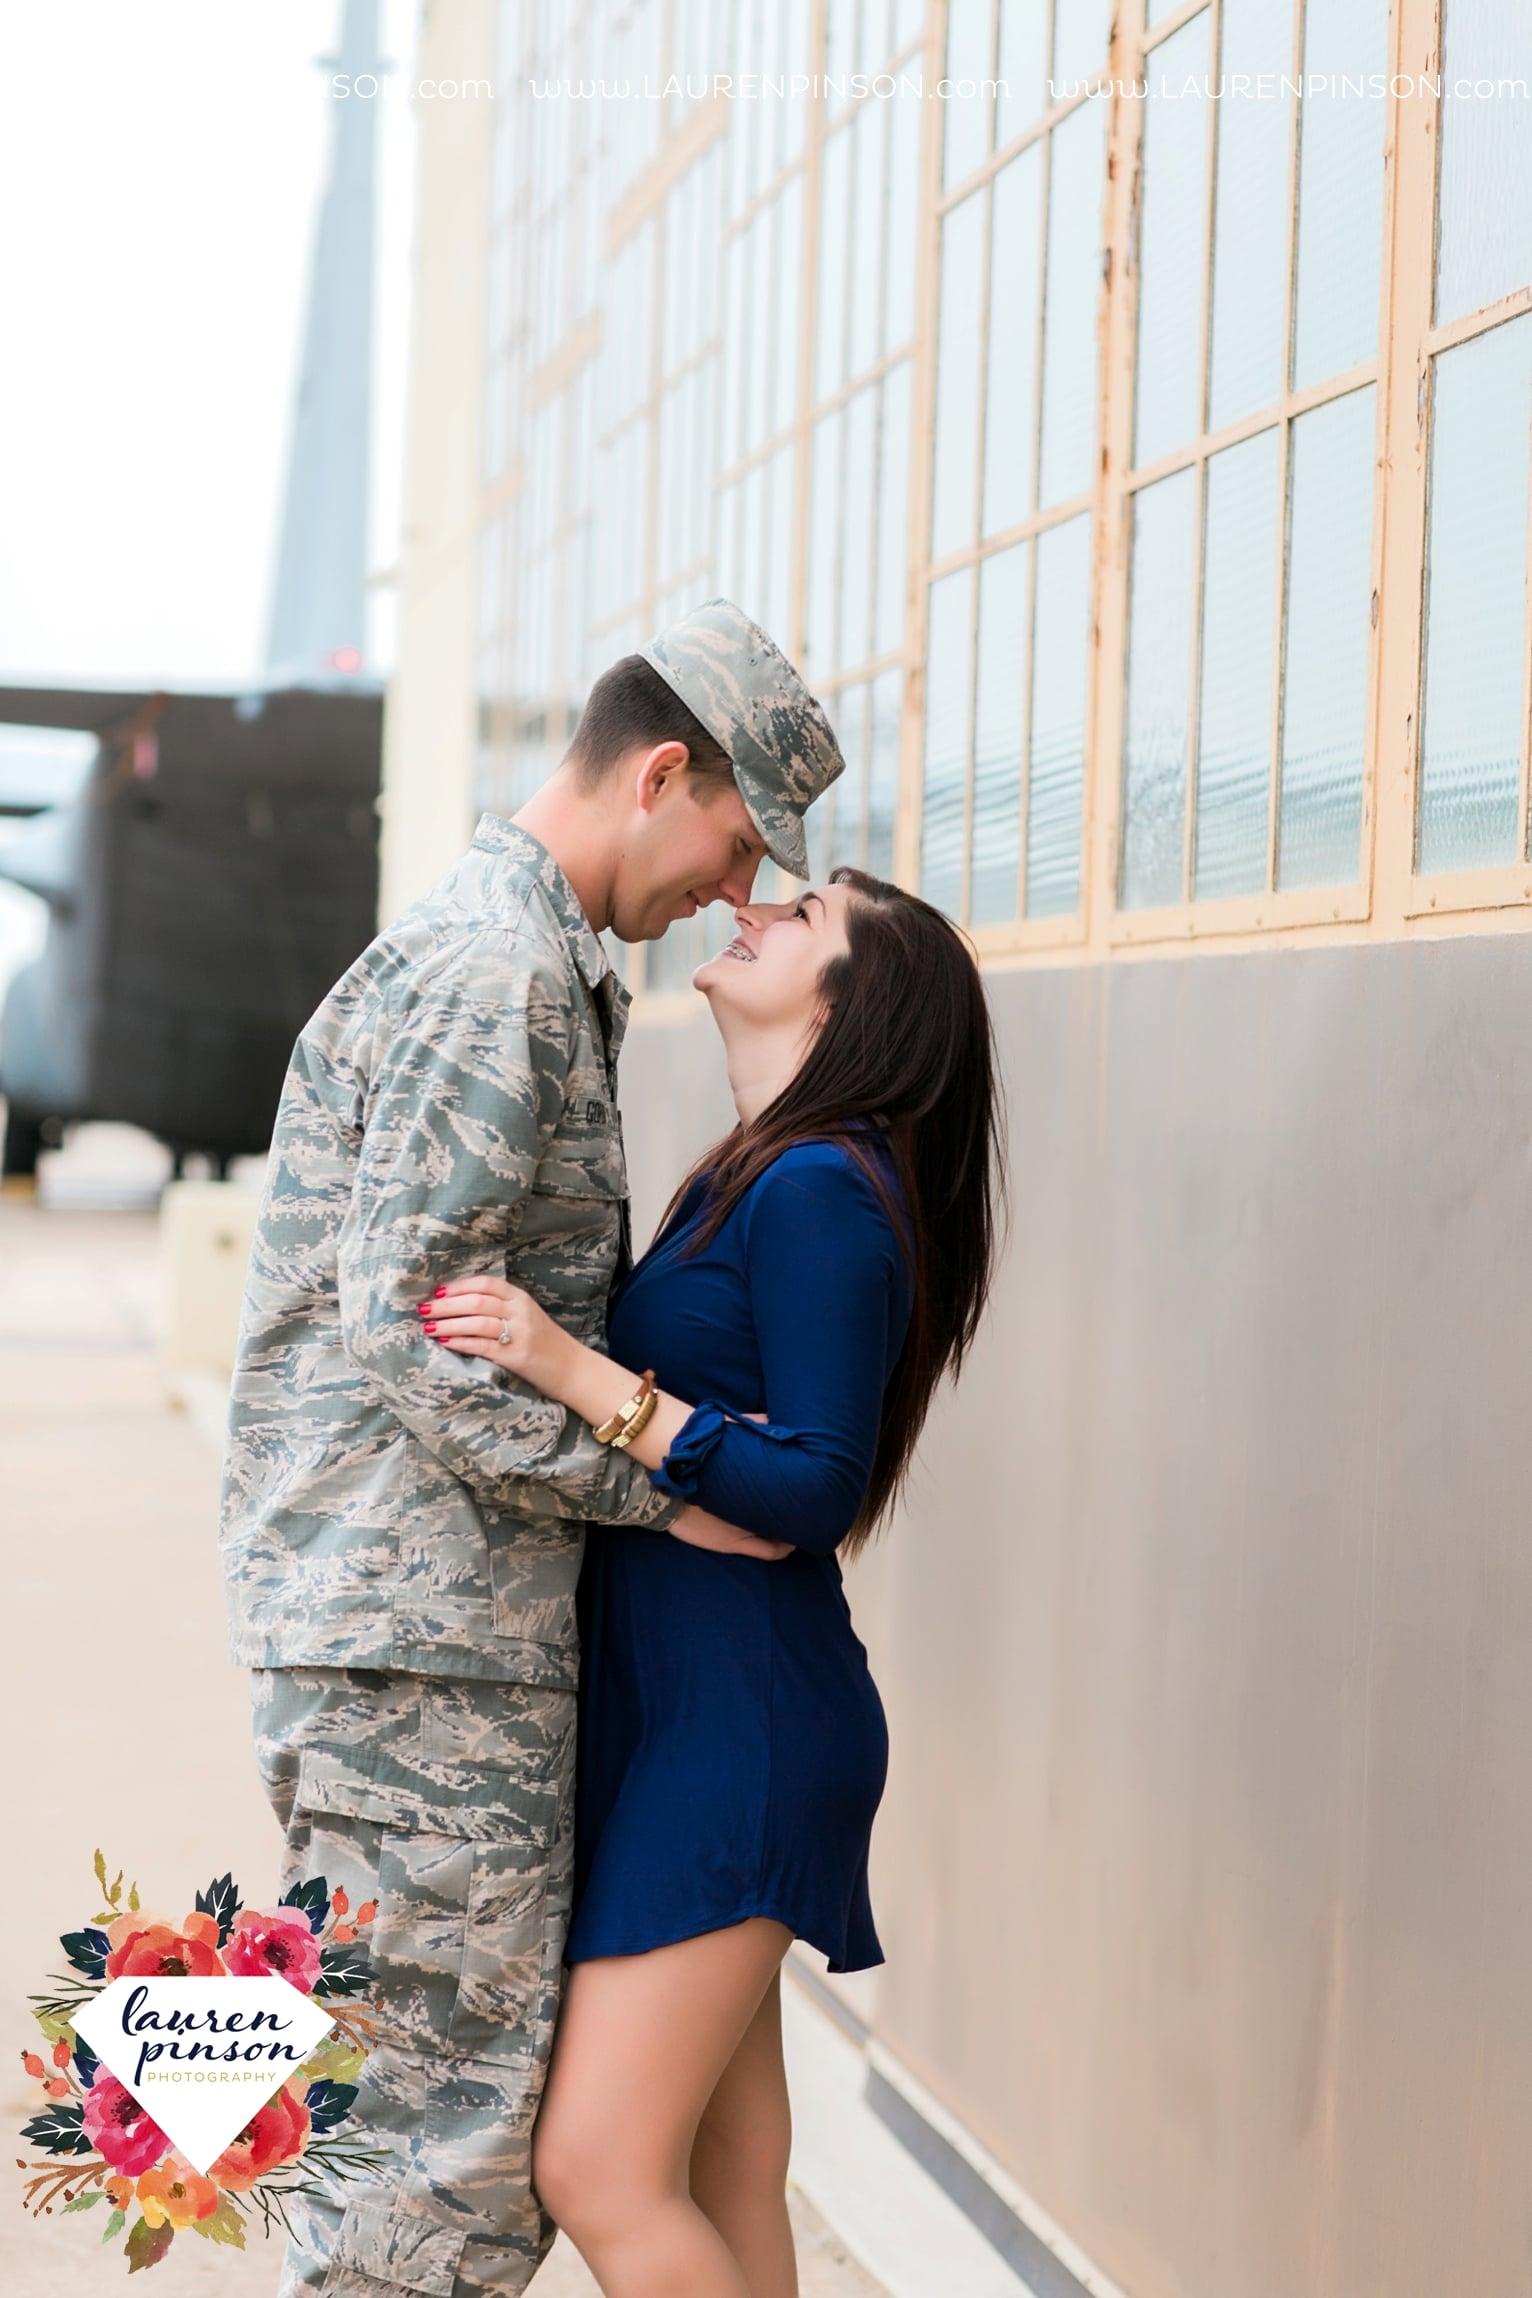 sheppard-afb-wichita-falls-engagement-session-airmen-in-uniform-abu-airplanes-bride-engagement-ring-texas-air-force-base_2005.jpg